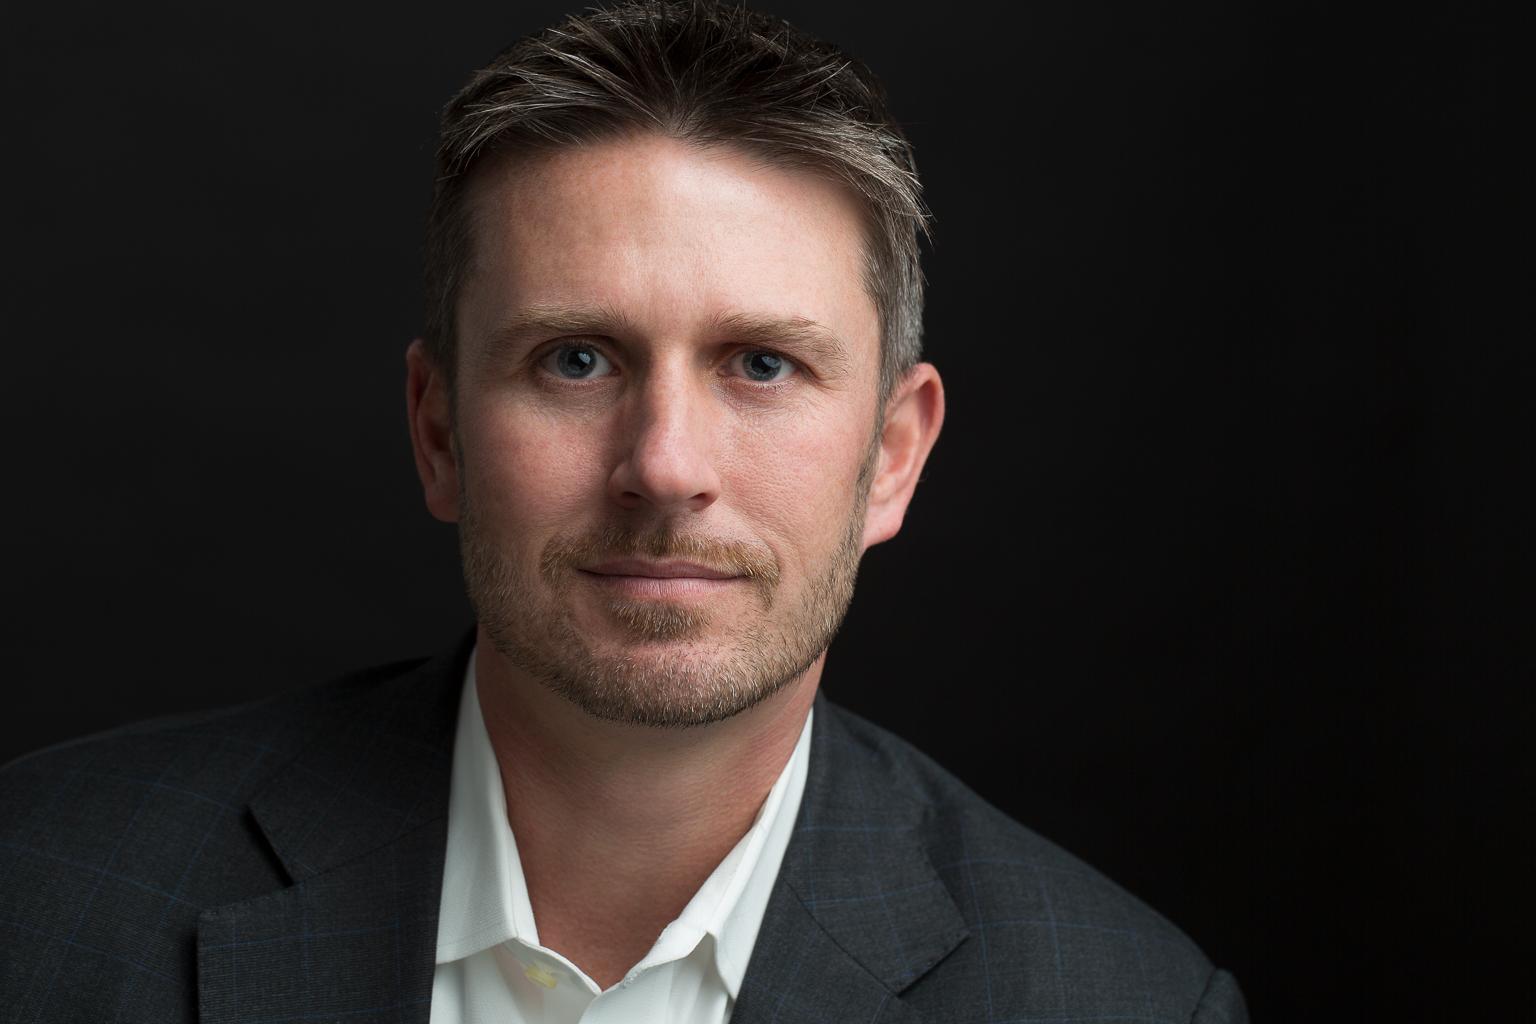 Executive Headshot for LinkedIn, Male, Black Background, No Tie